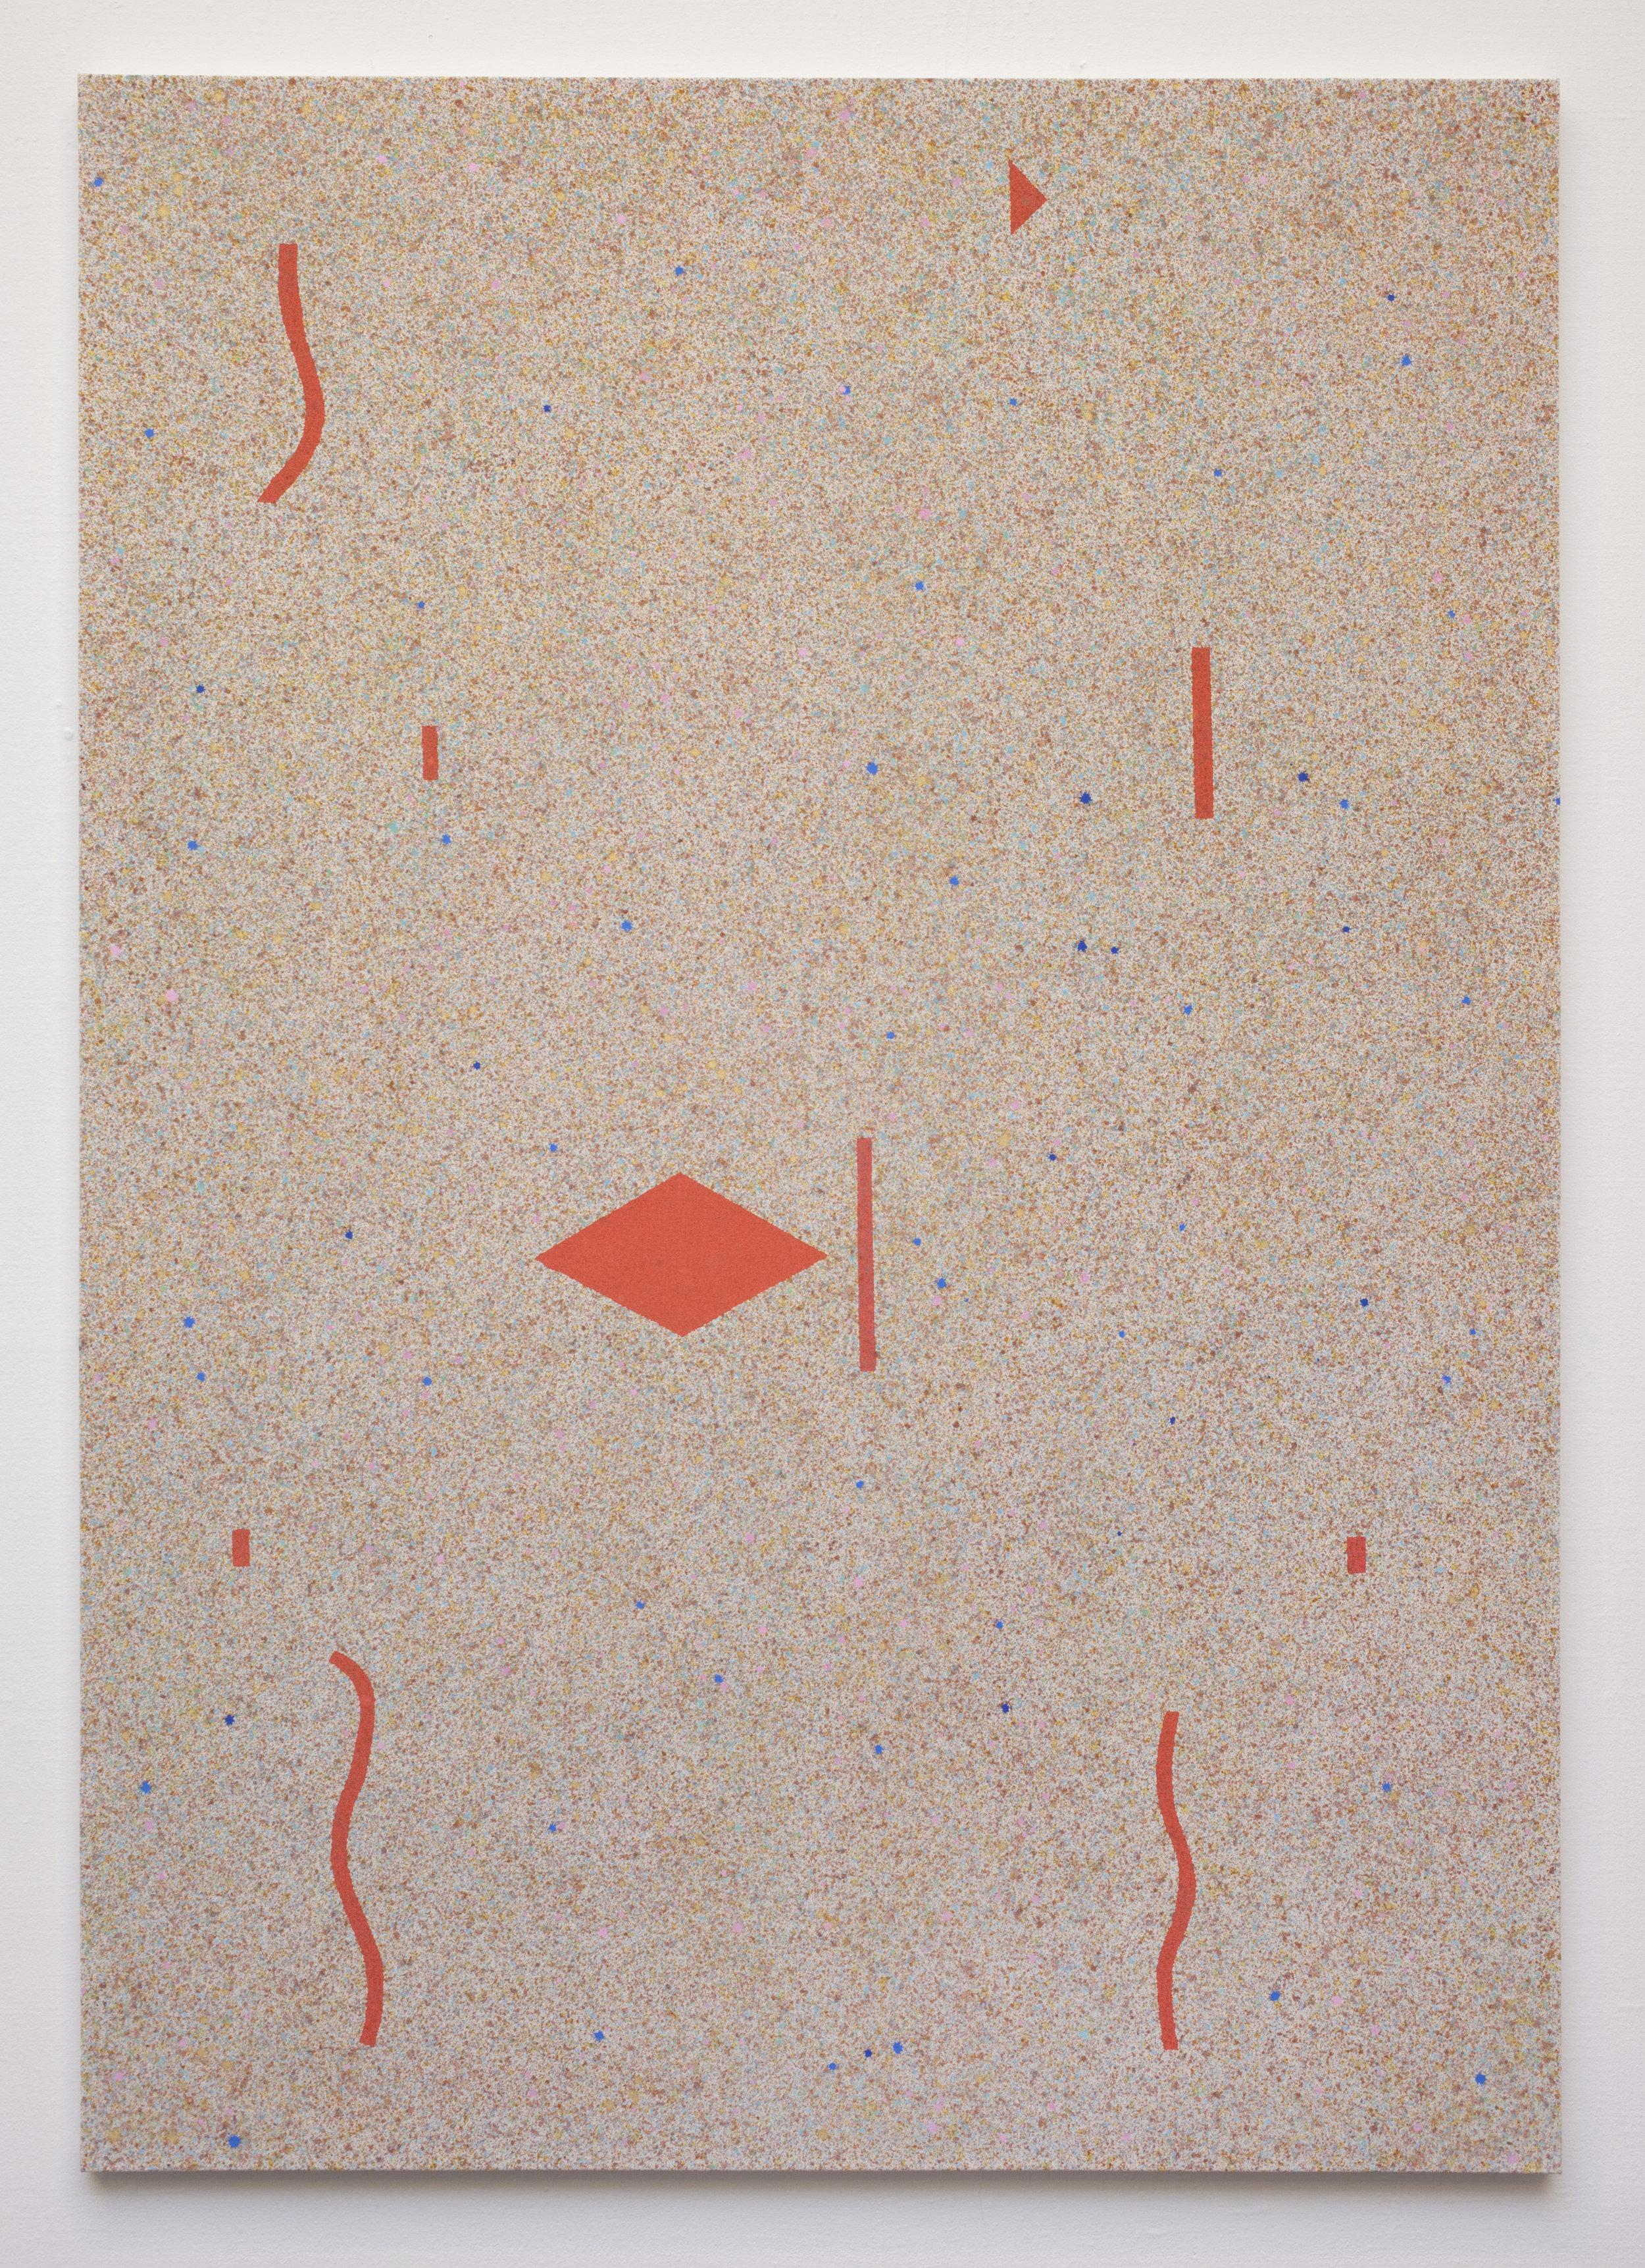 - 36. Bodil Nielsen. Untitled. 2012. Acrylic on canvas. 35 x 52 cm.